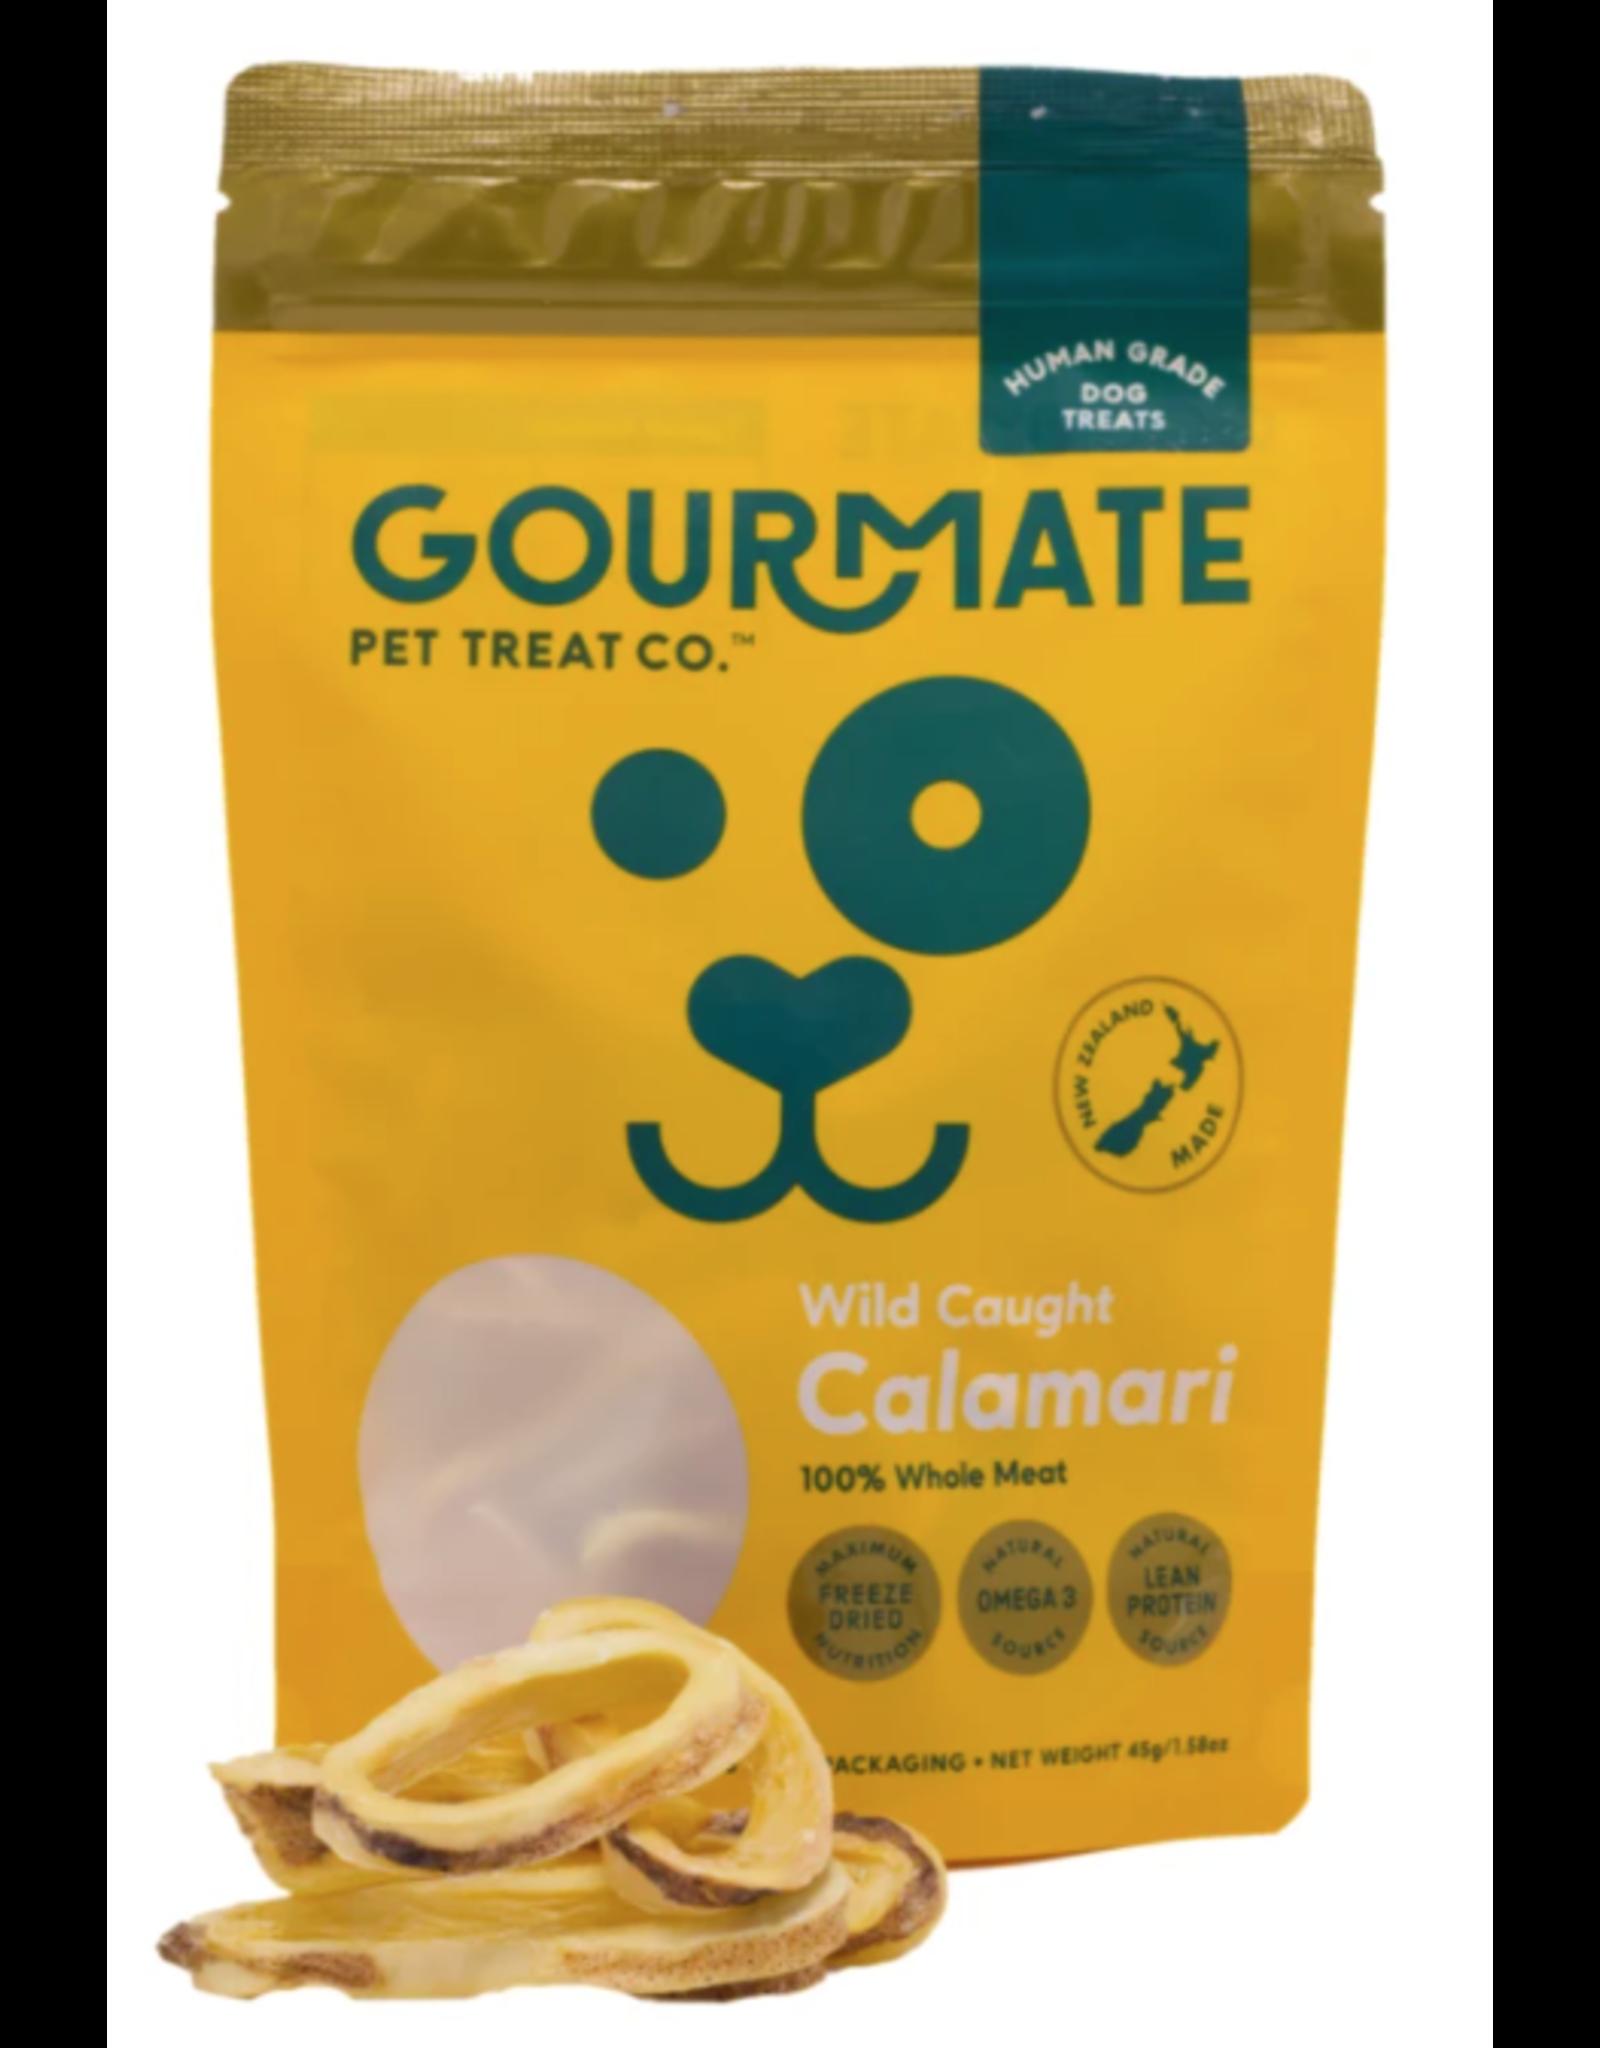 Gourmate Pet Treat Company Gourmate Pet Treat Co. Wild Caught Calamari 1.76oz